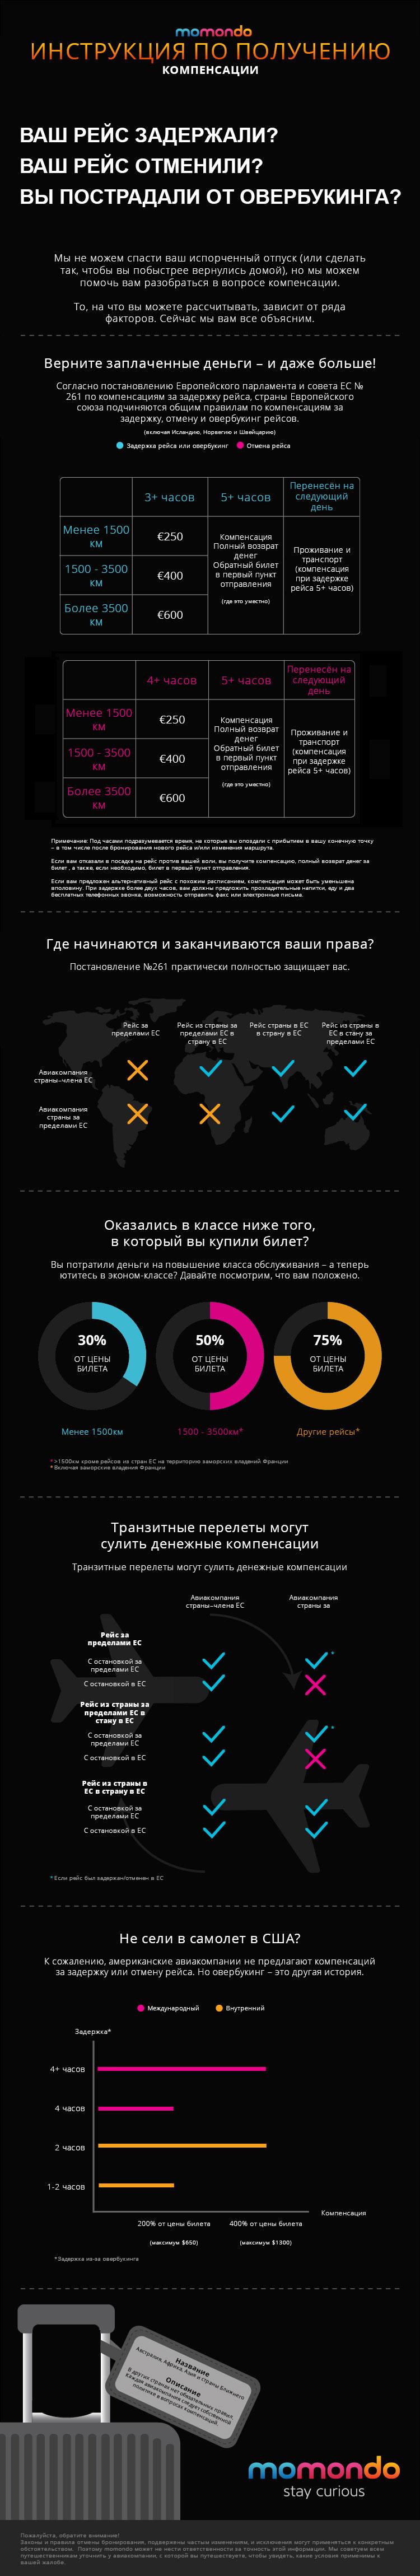 inforgraphic-ru